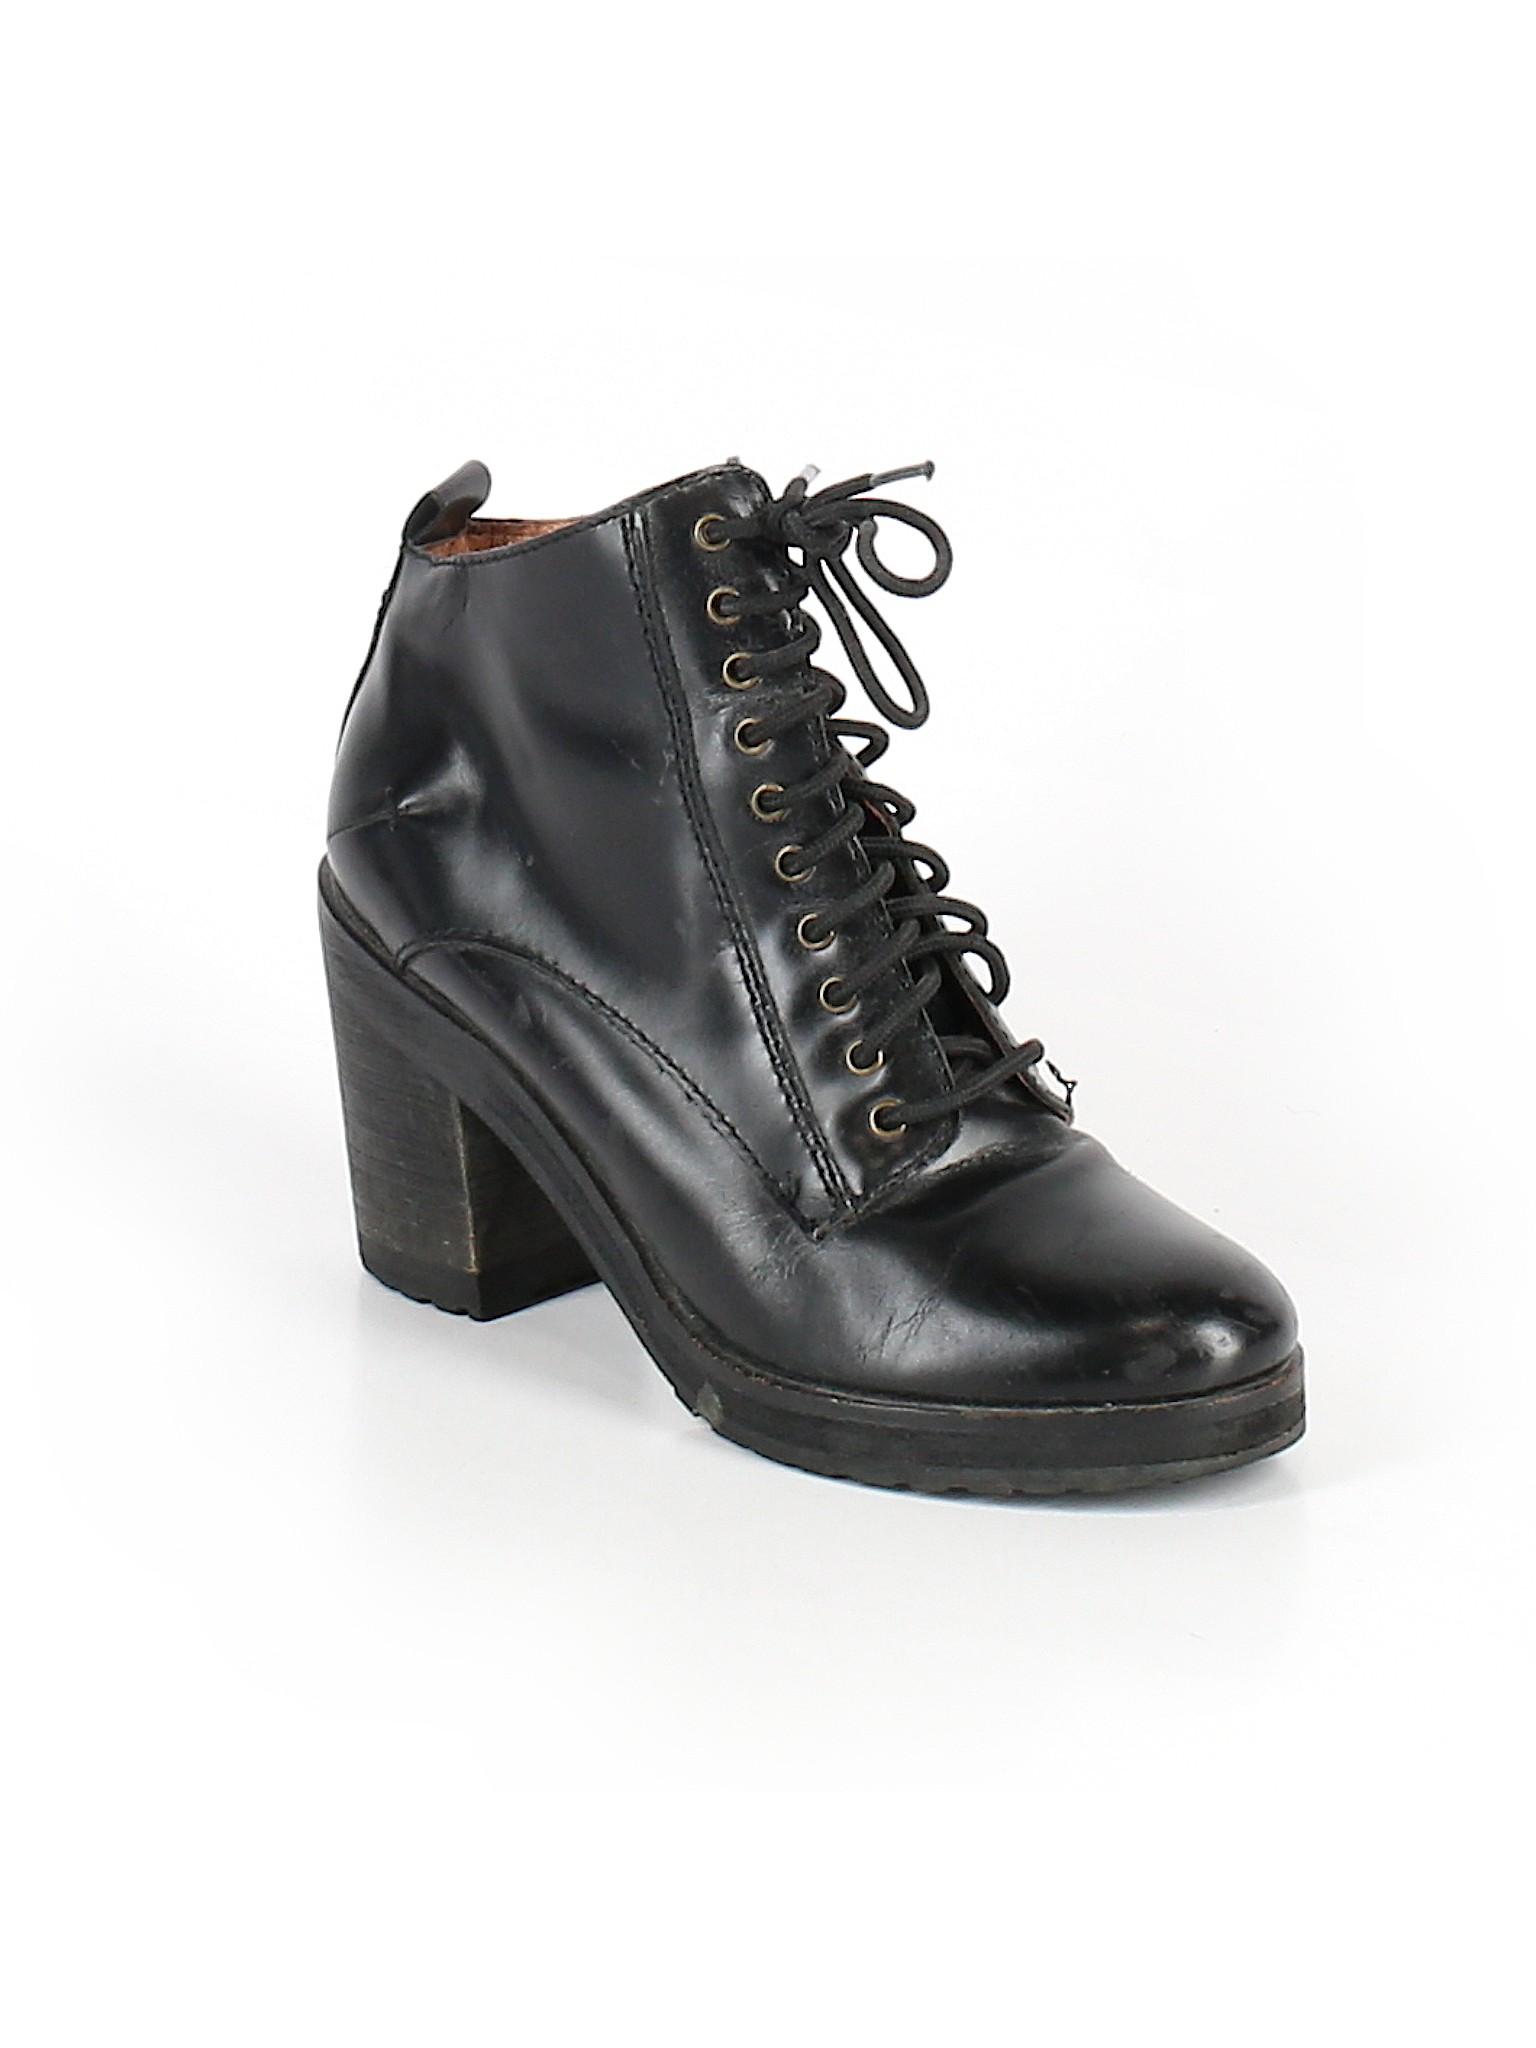 Miz Boutique promotion Boutique promotion Boots Mooz wza0vCq